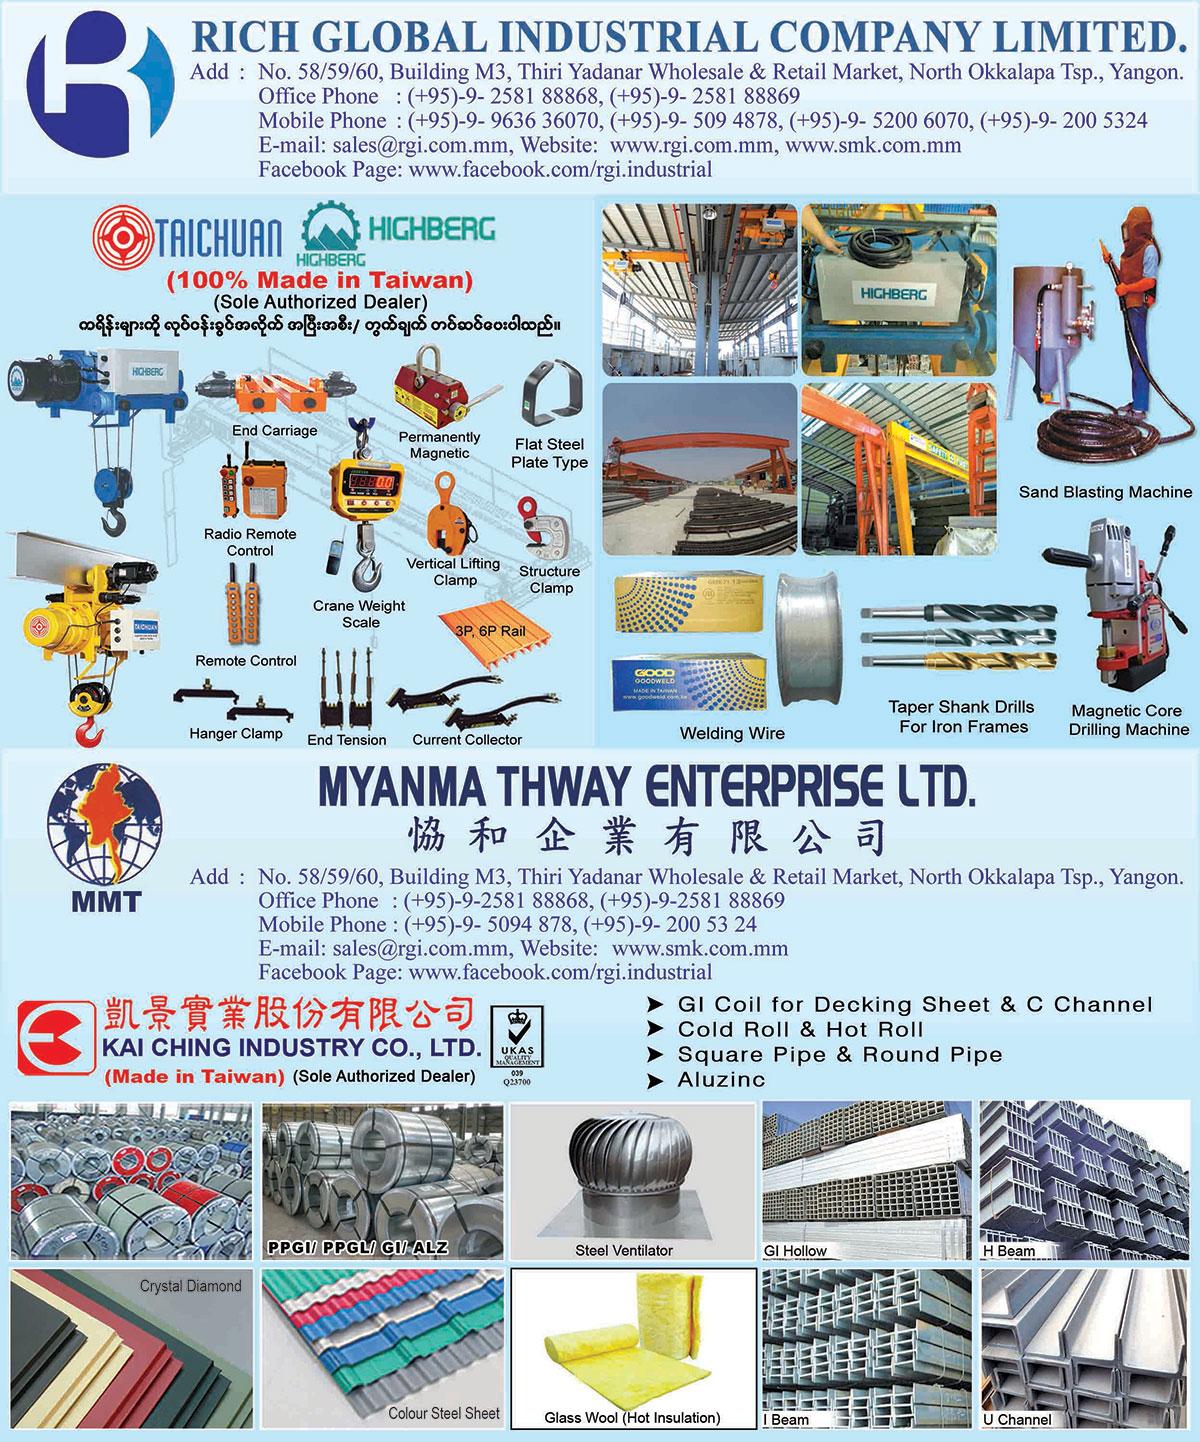 Rich Global Industrial Co., Ltd.Construction & Contractor Equipment & Supplies